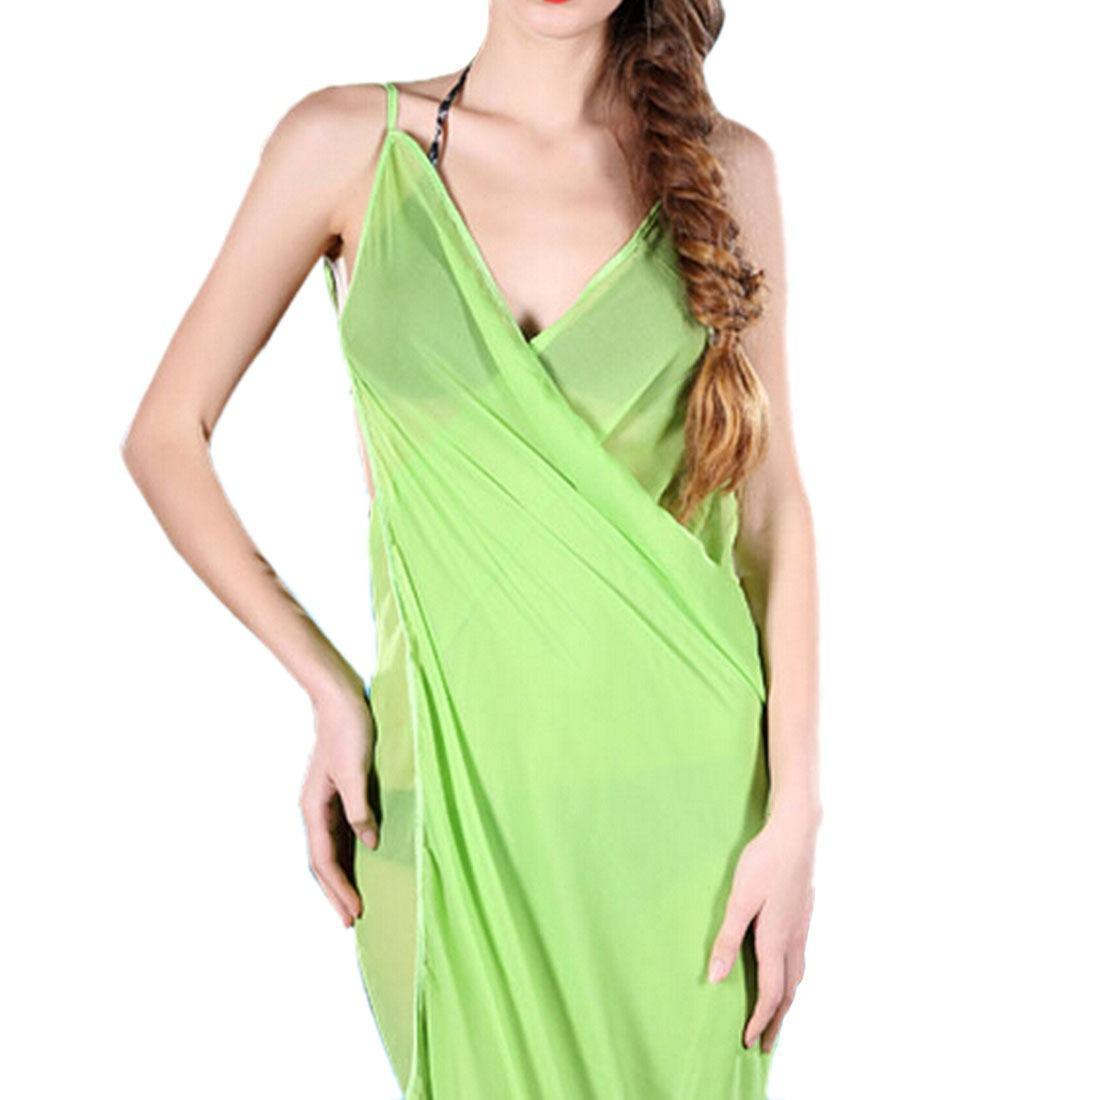 Women s fashion bath towel beach print dresses 17 new hot women beach dress y sling wear sarong women s colorful dashiki beach dress india black hot women s new.